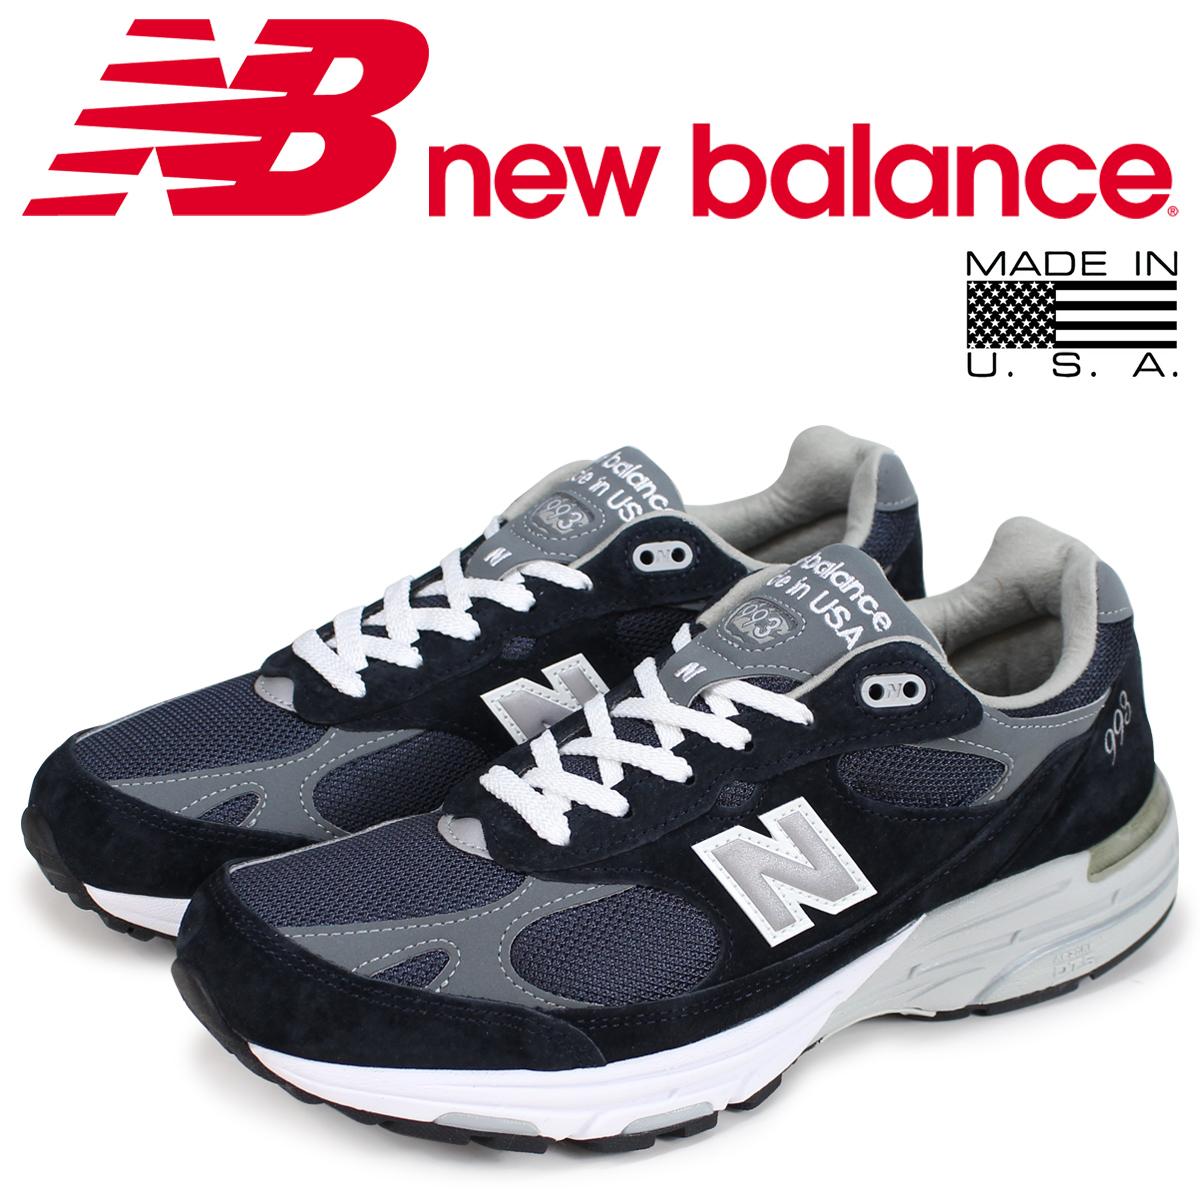 Finding Cheap New Balance 993 Running Shoes Online | New